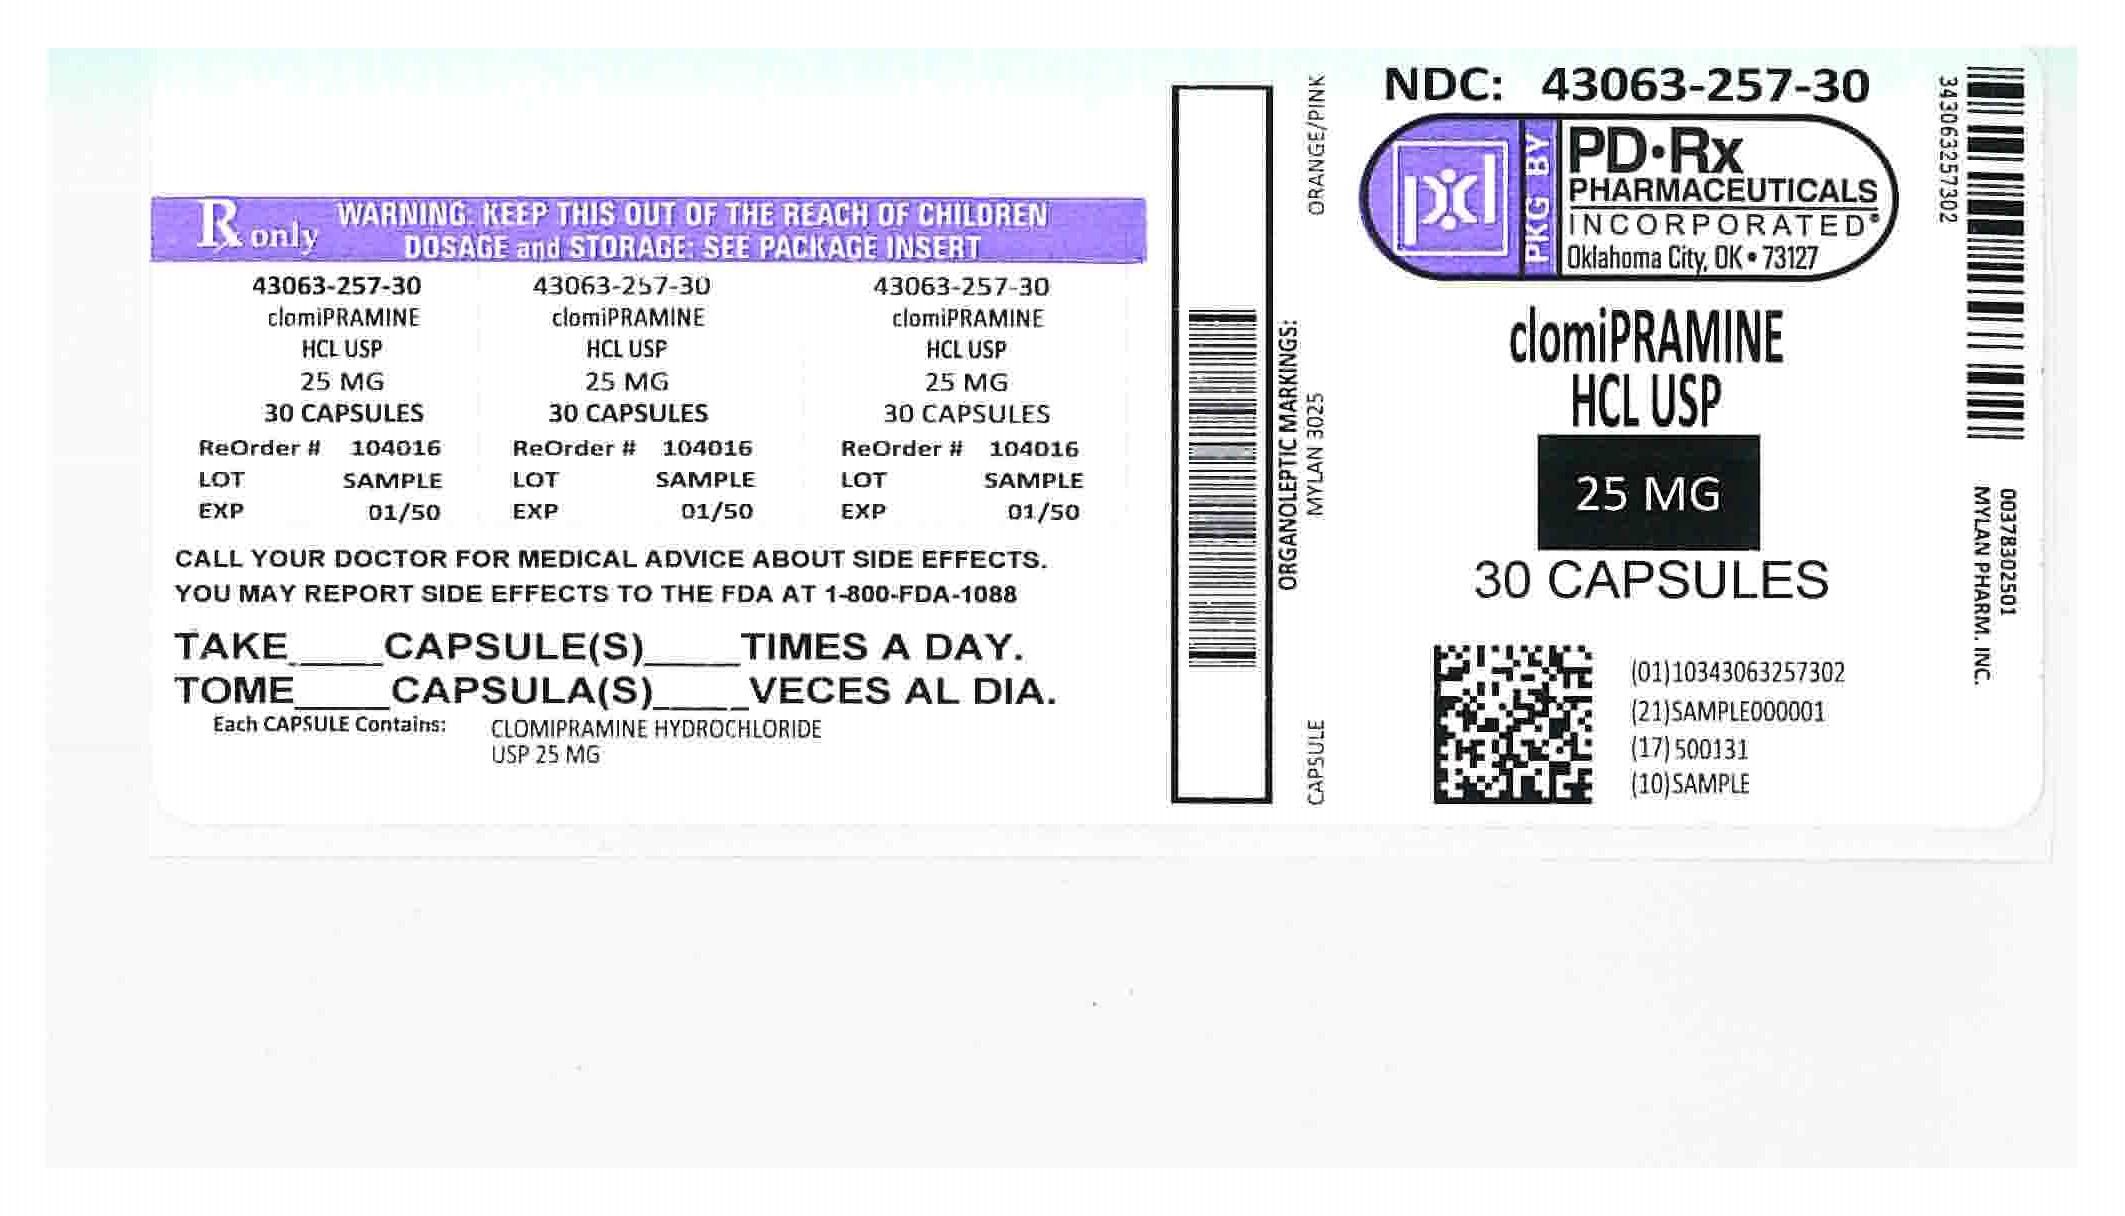 43063257 Label